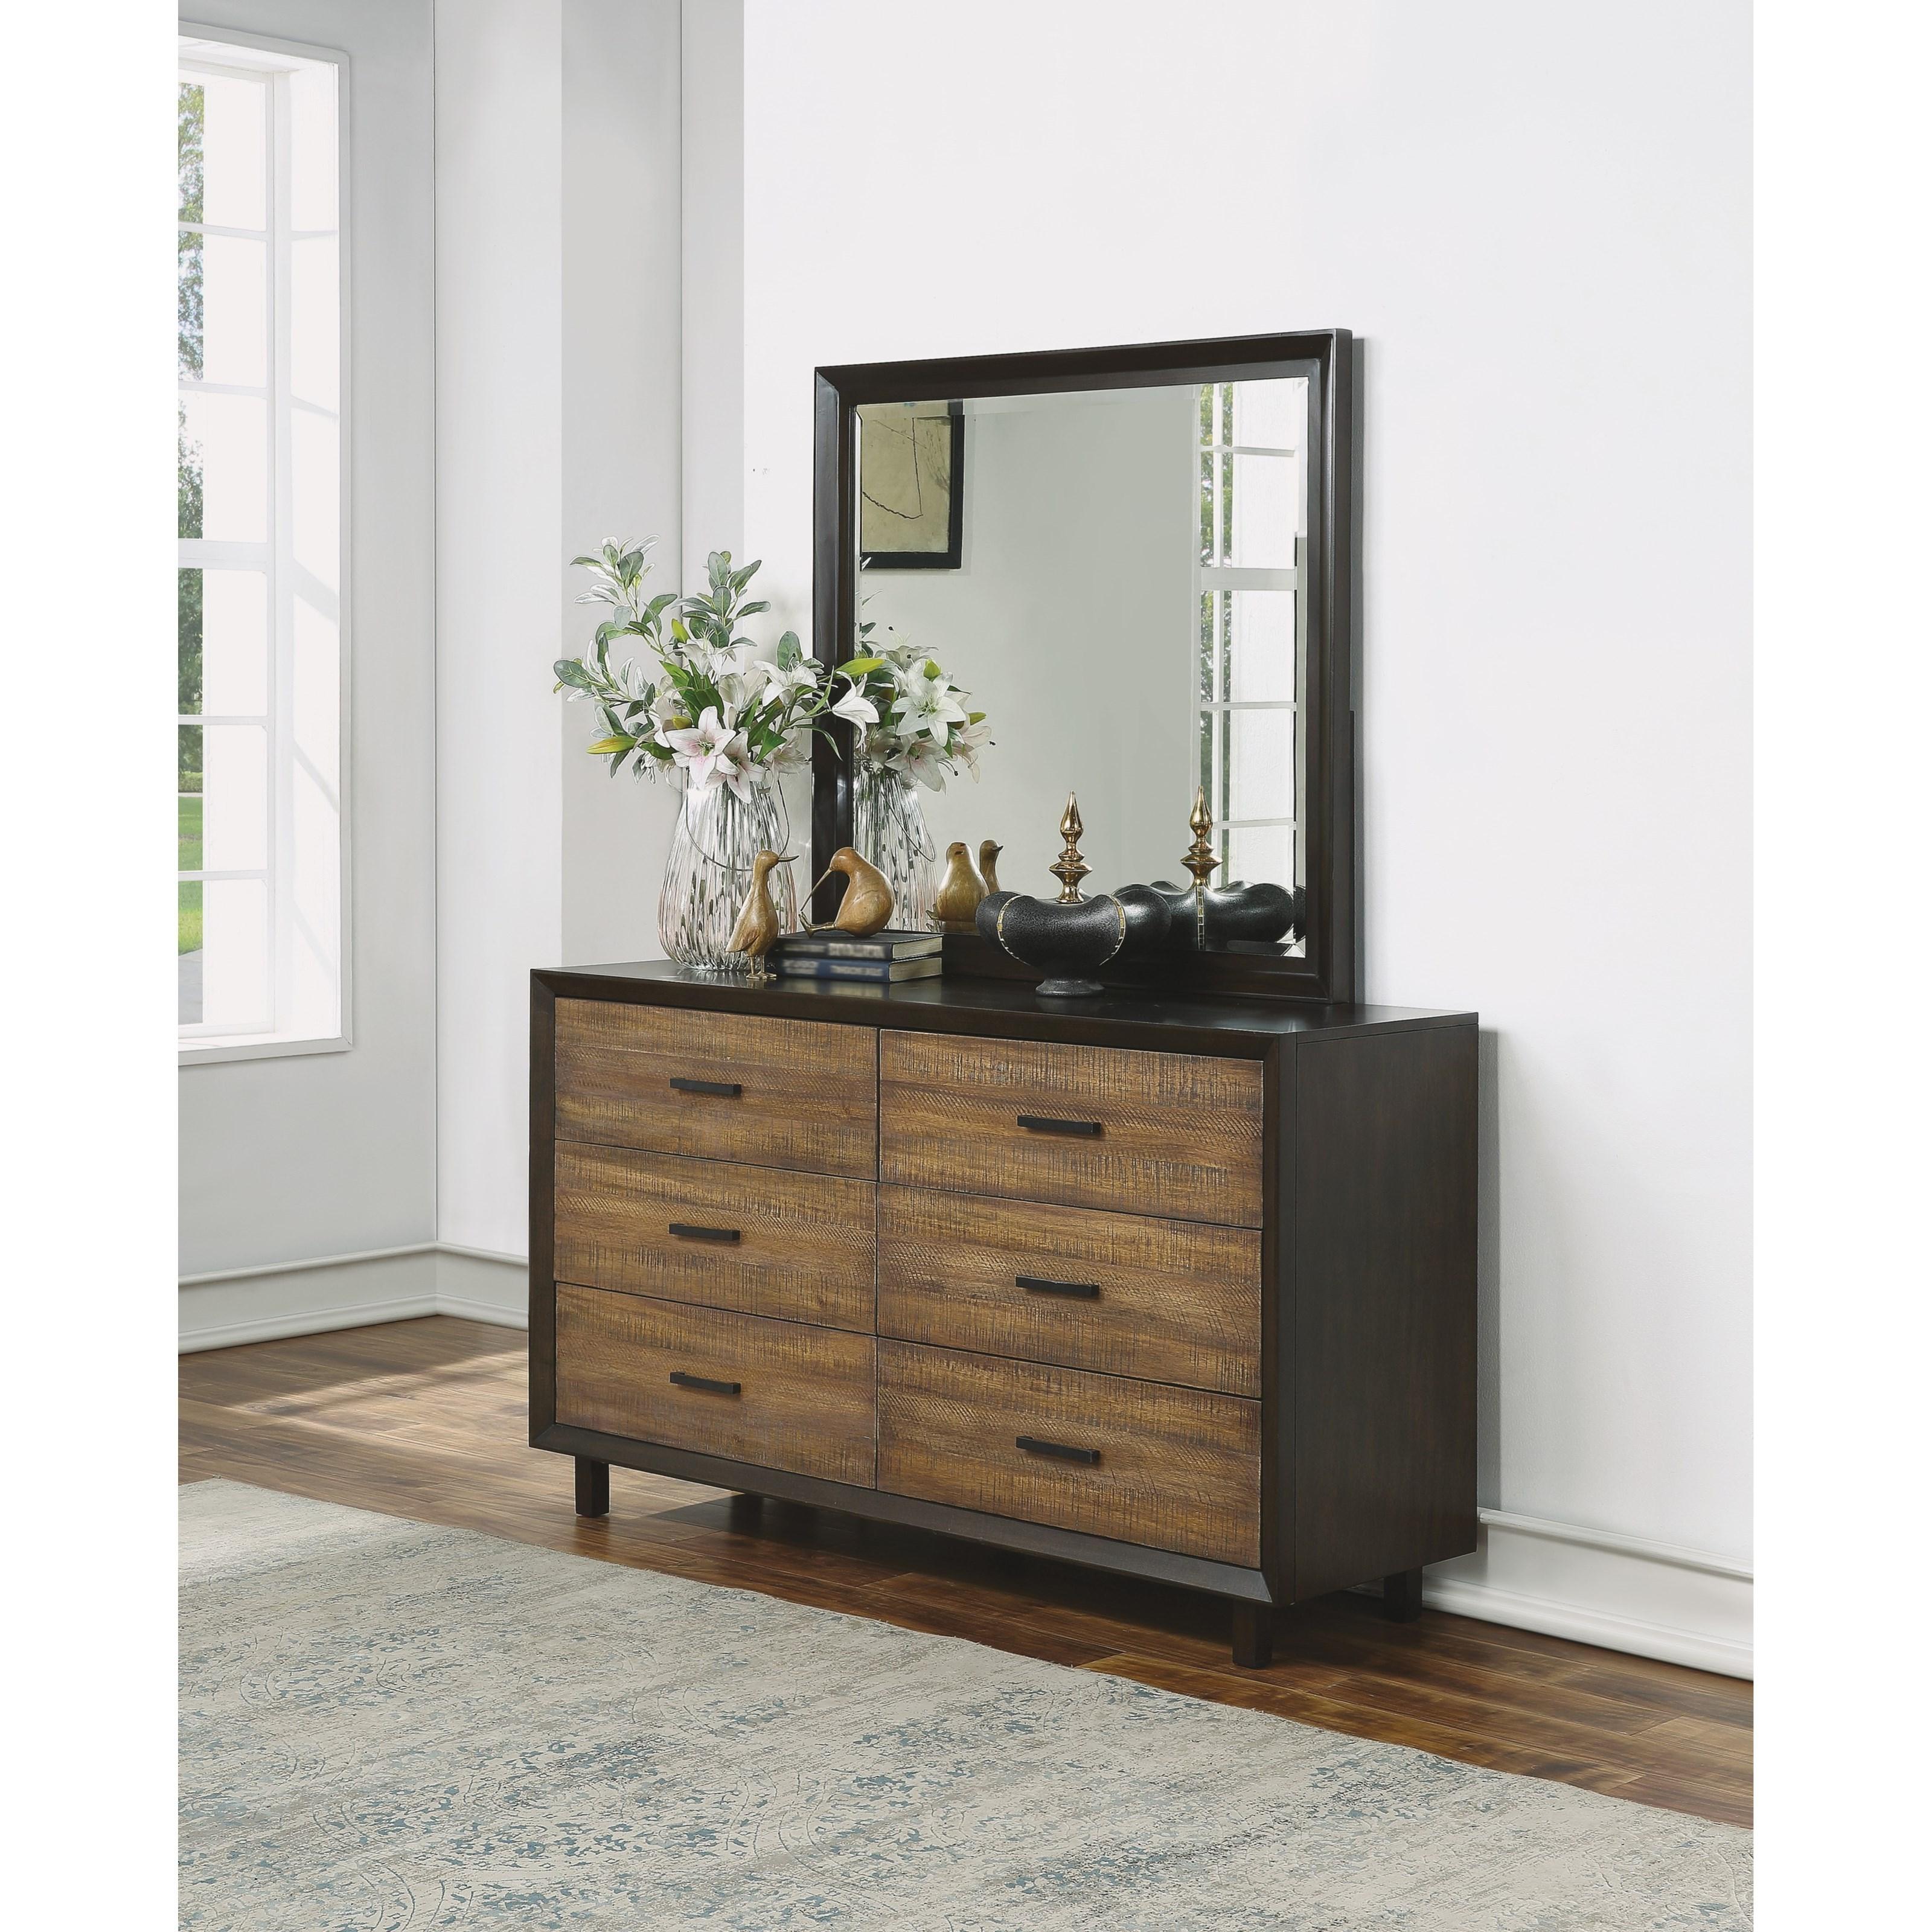 Alpine Dresser and Mirror Set by Flexsteel Wynwood Collection at Steger's Furniture